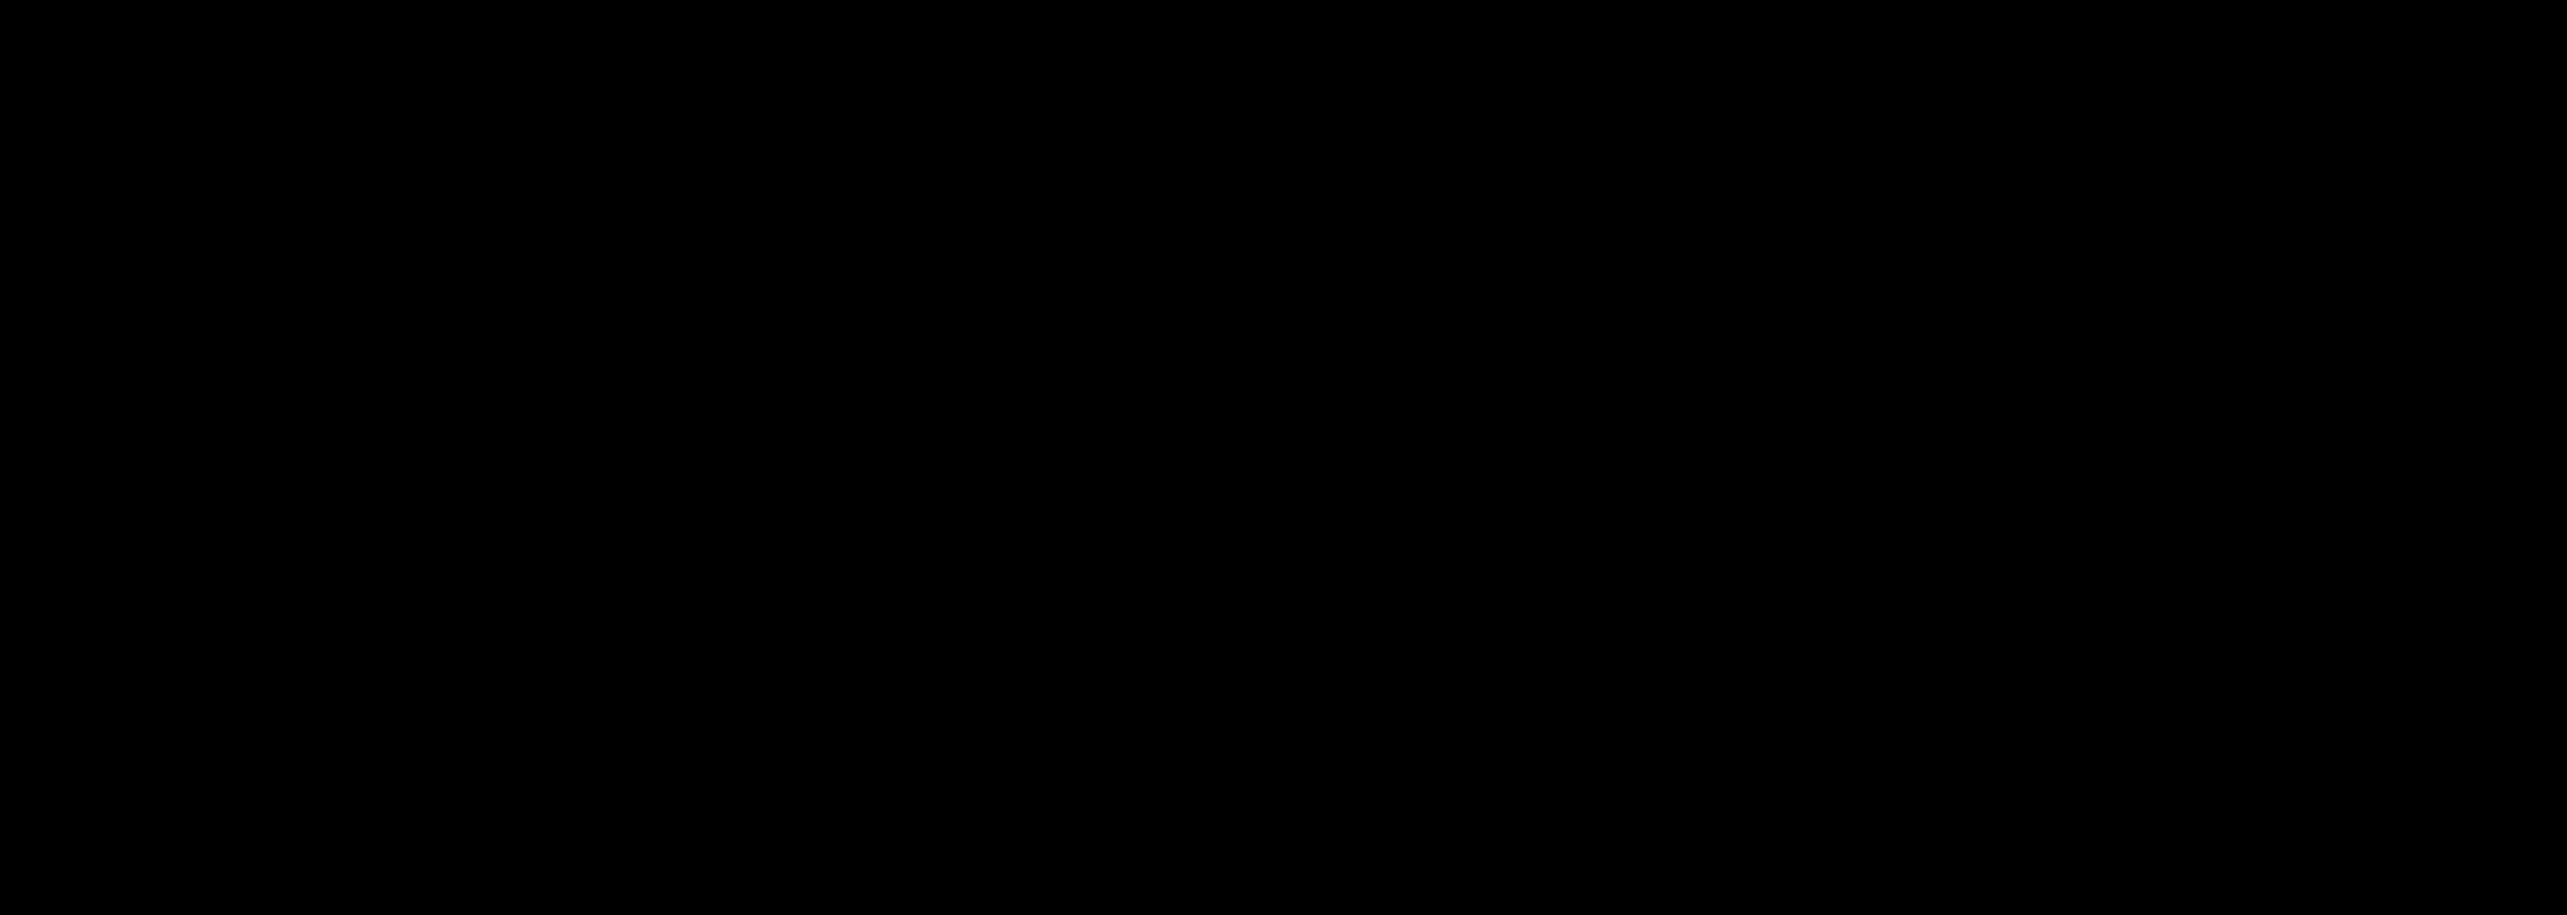 logo_sytalmd_preto_claim